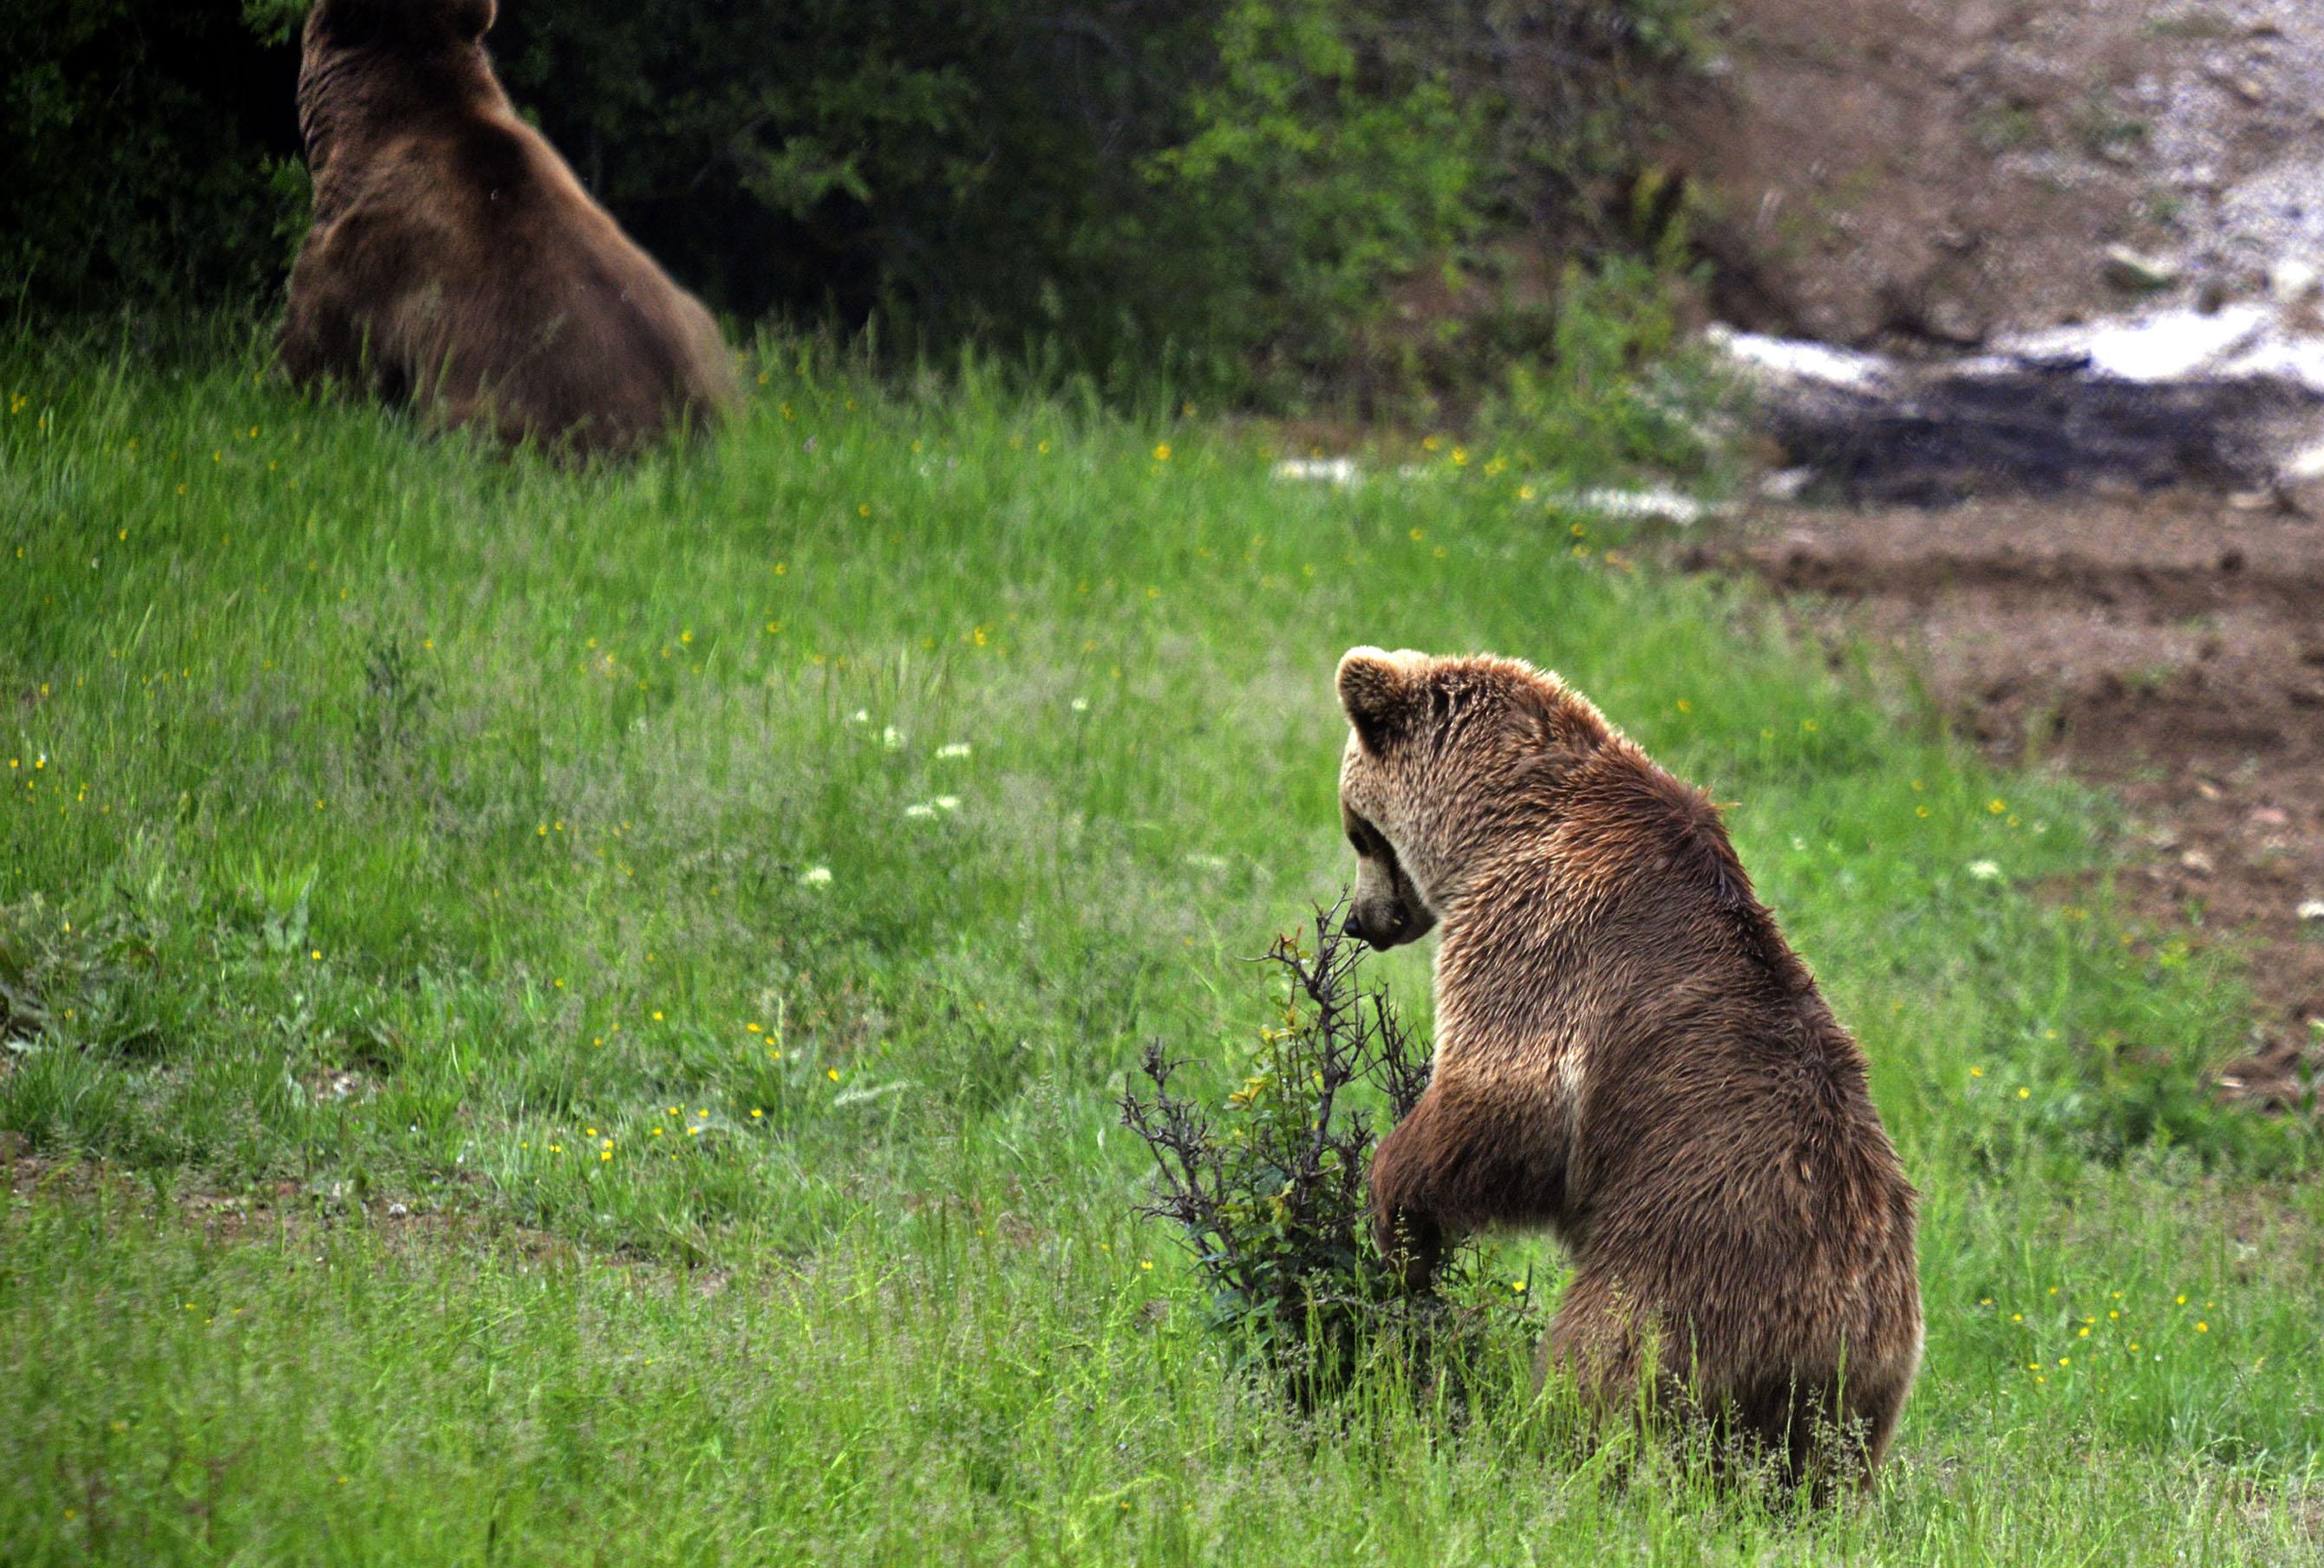 BROWN BEARS RESCUE IN KOSOVO 2013